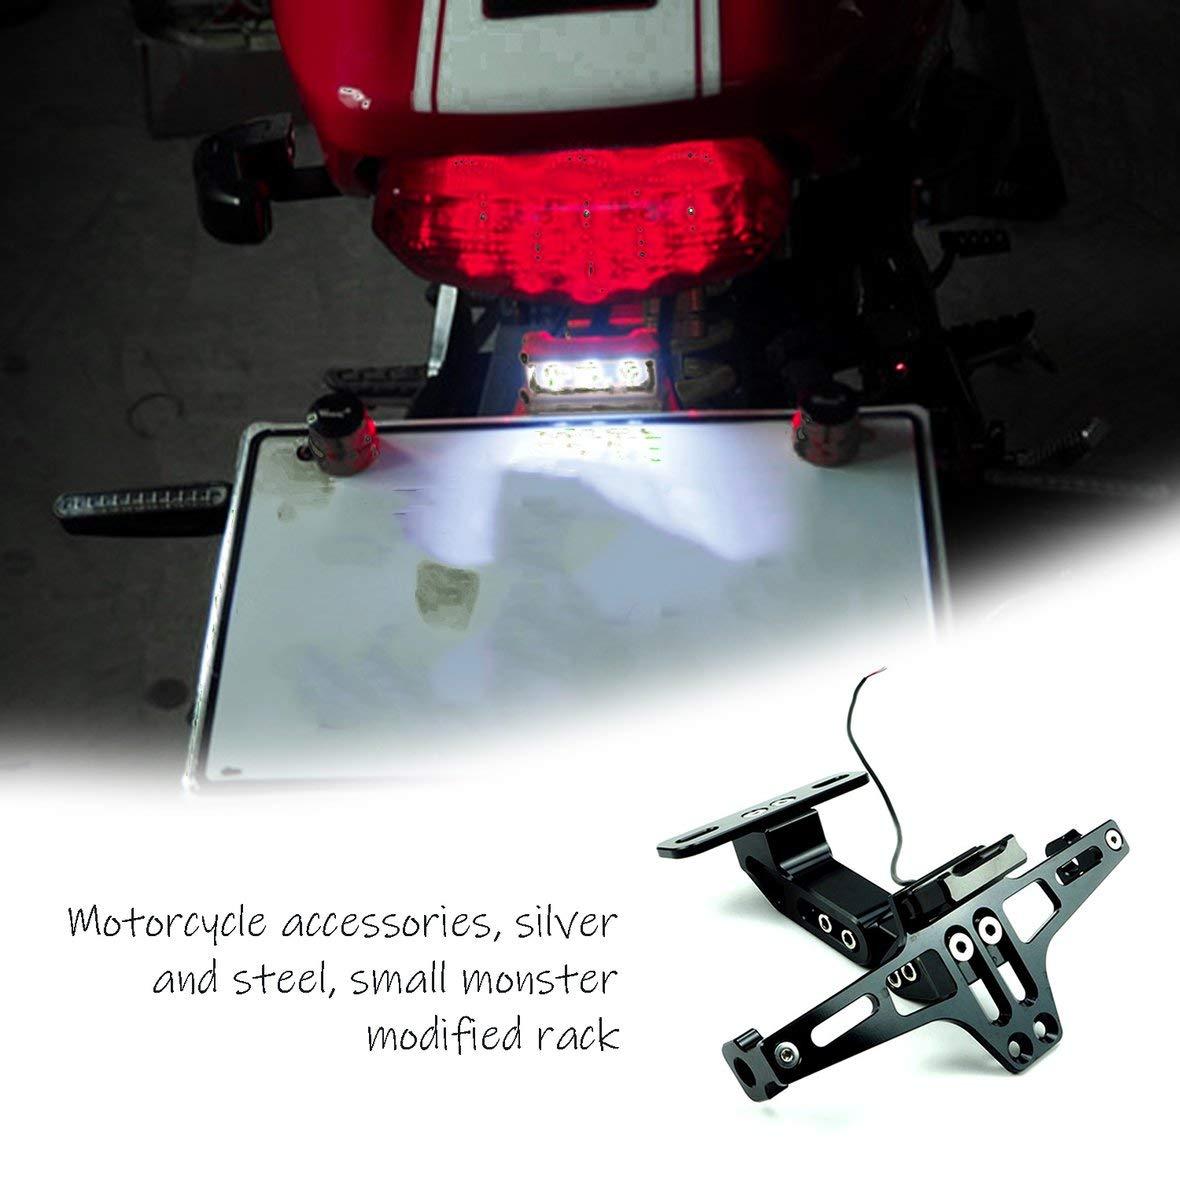 Heaviesk Motorrad hinterer Kennzeichenhalter Kennzeichenhalter Kennzeichenrahmen Richtungsanzeiger Motorradzubeh/ör